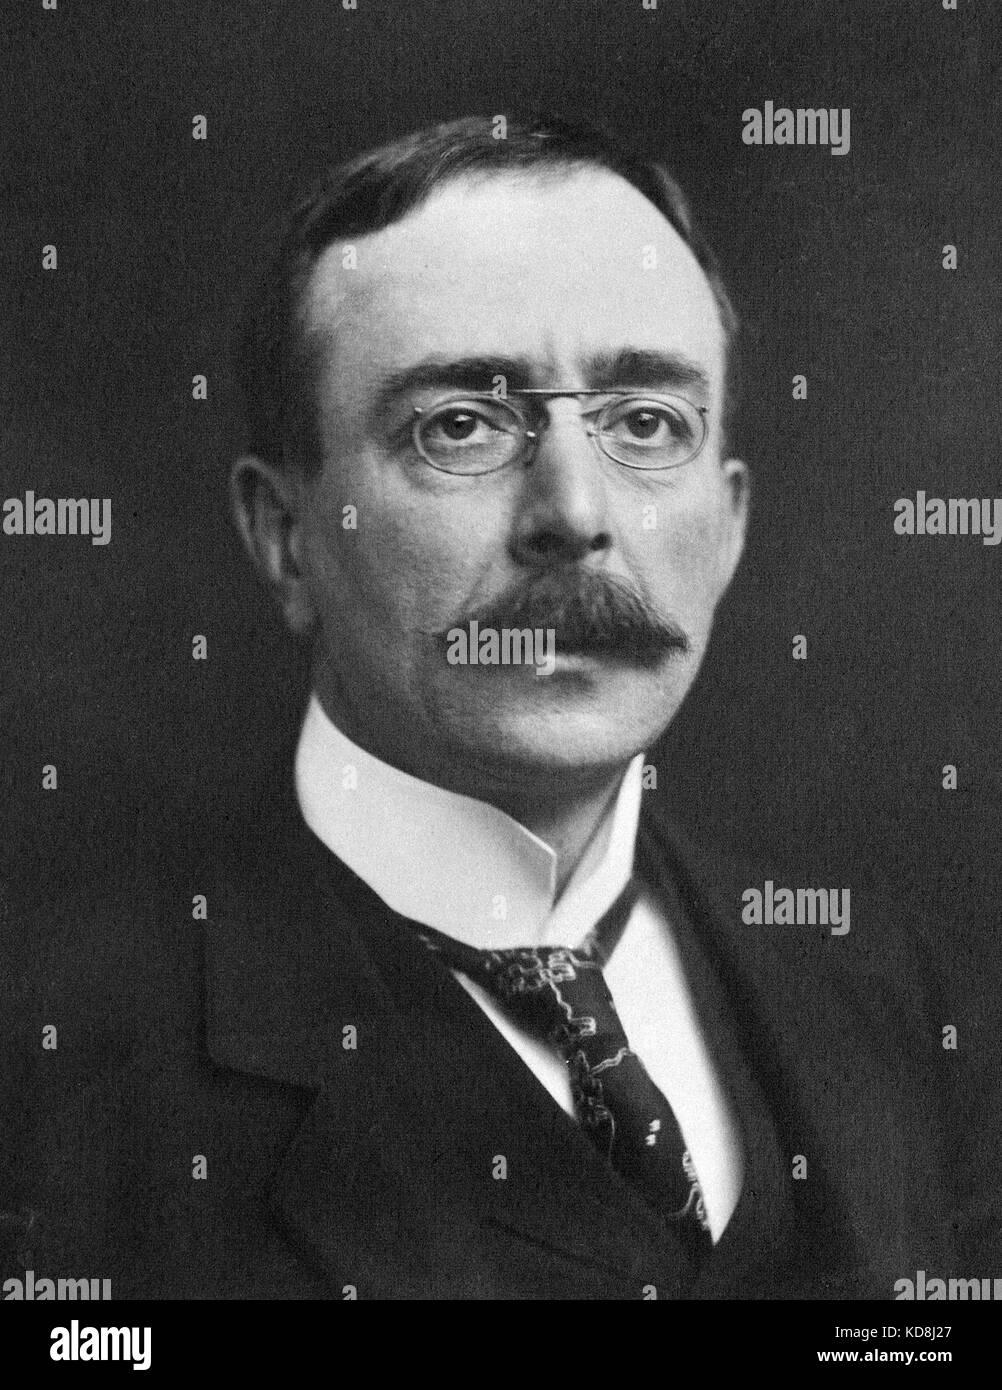 CHARLES SCOTT SHERRINGTON 1857 1952 English Neurologist Who Won The Nobel Prize In